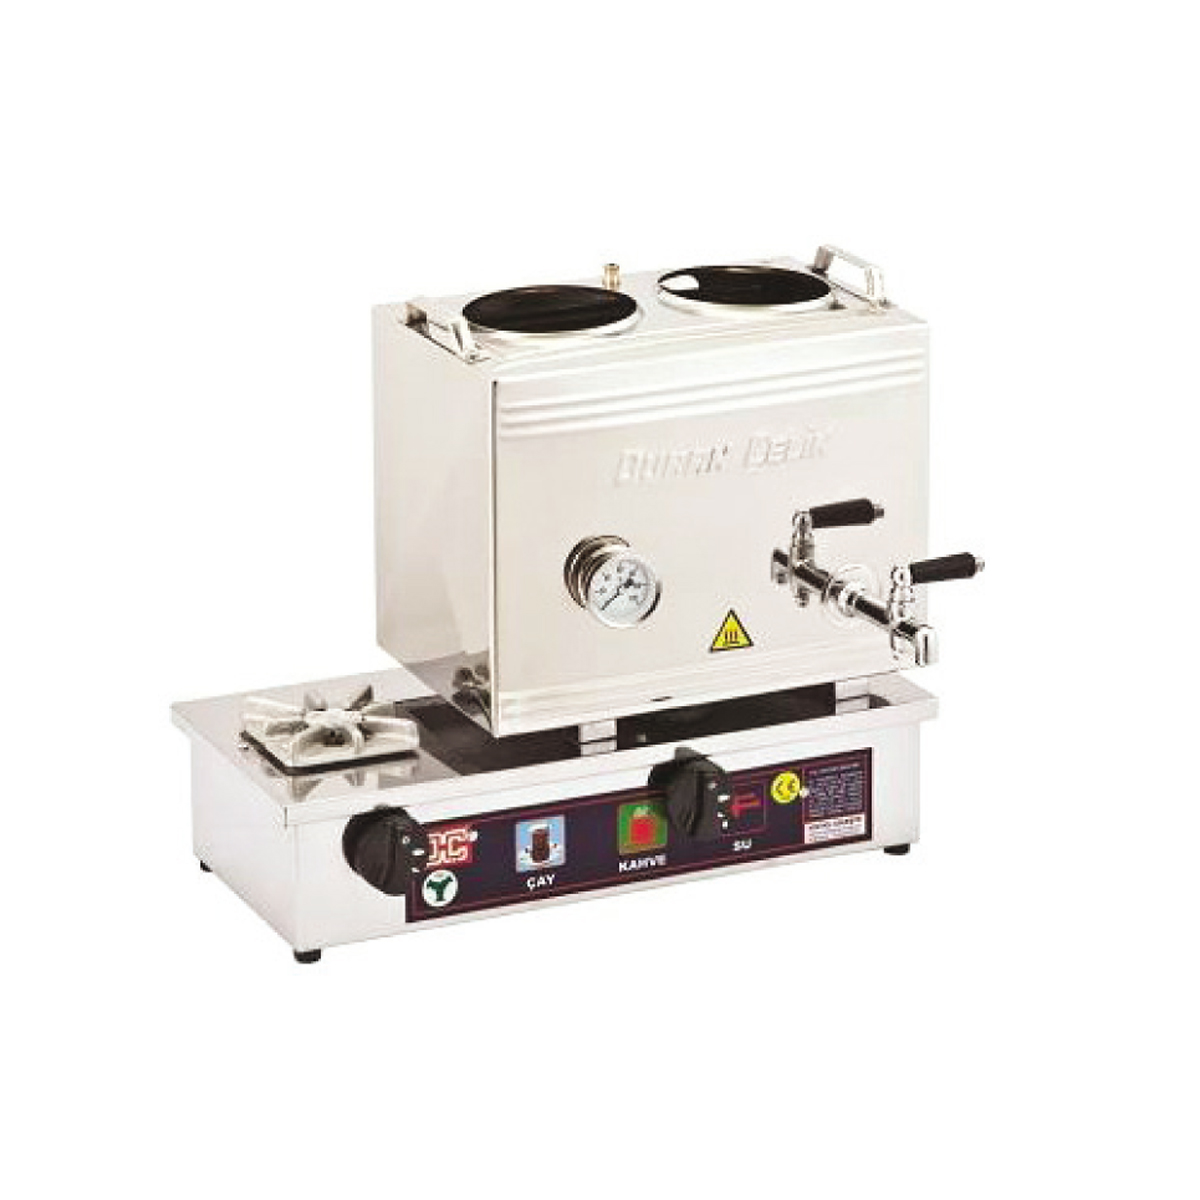 Tea Boiler Welded 30 - Electric